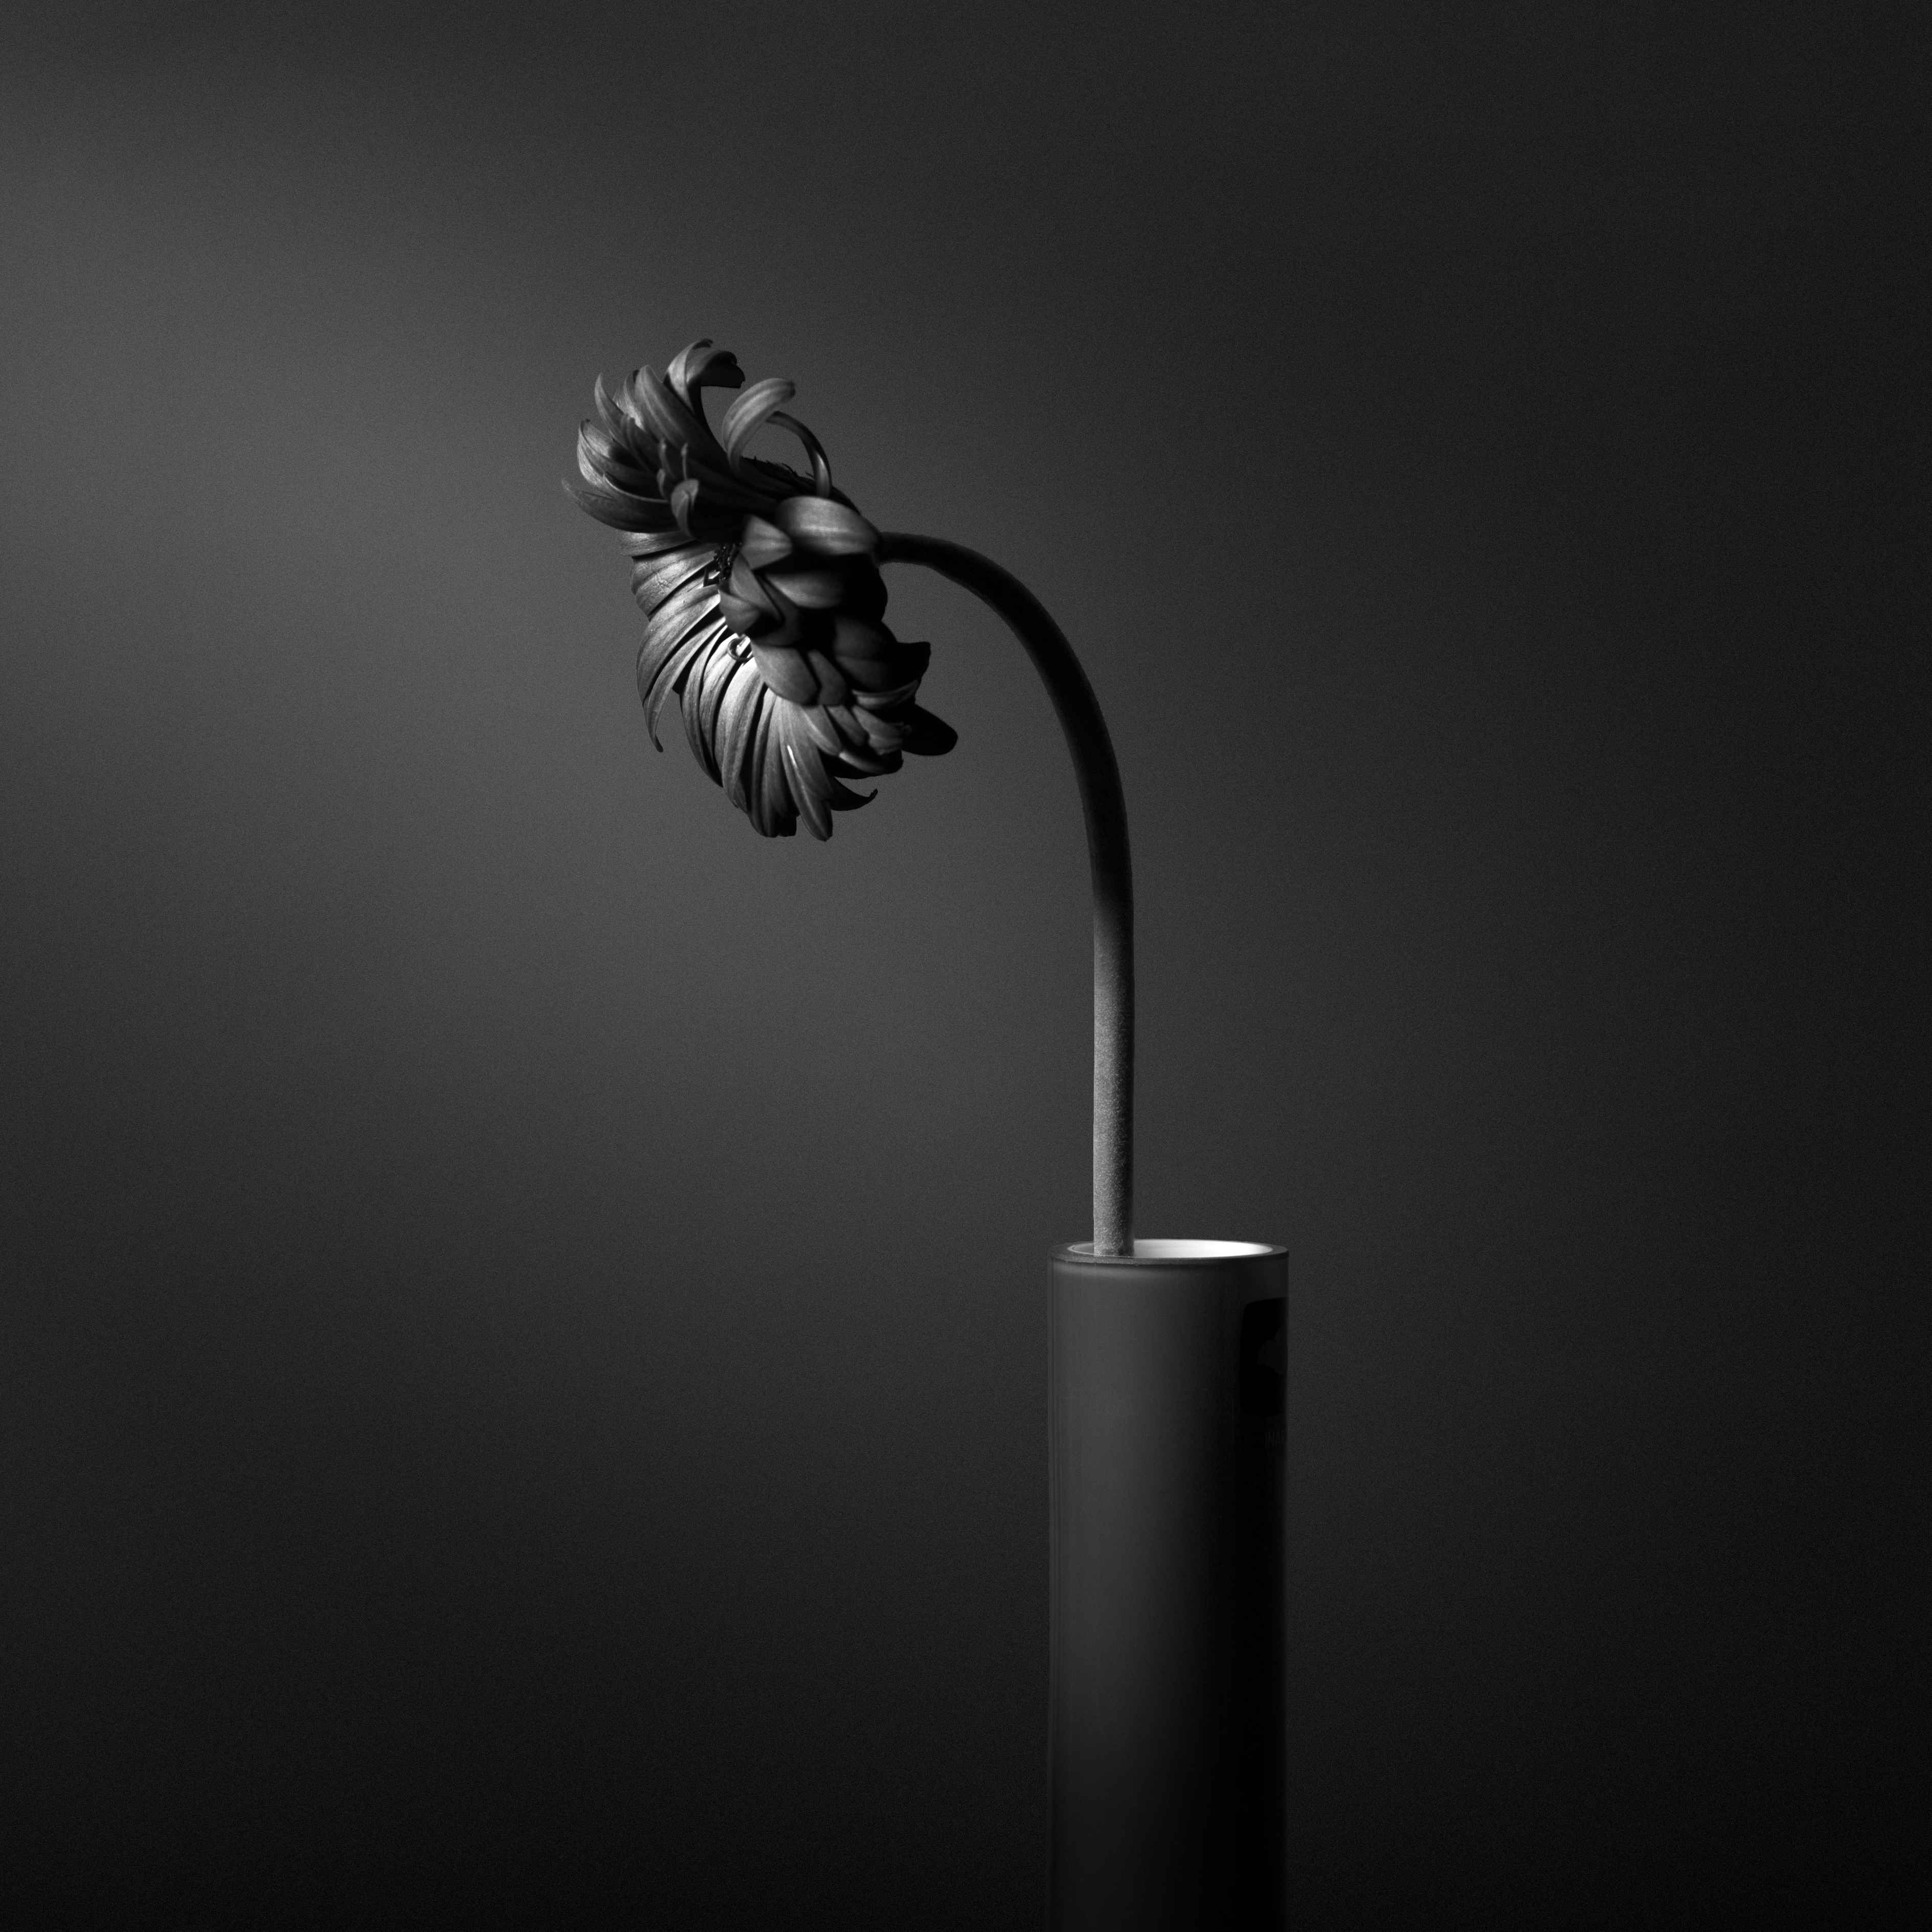 Black and White Still life photography | BWVISION - Black ...